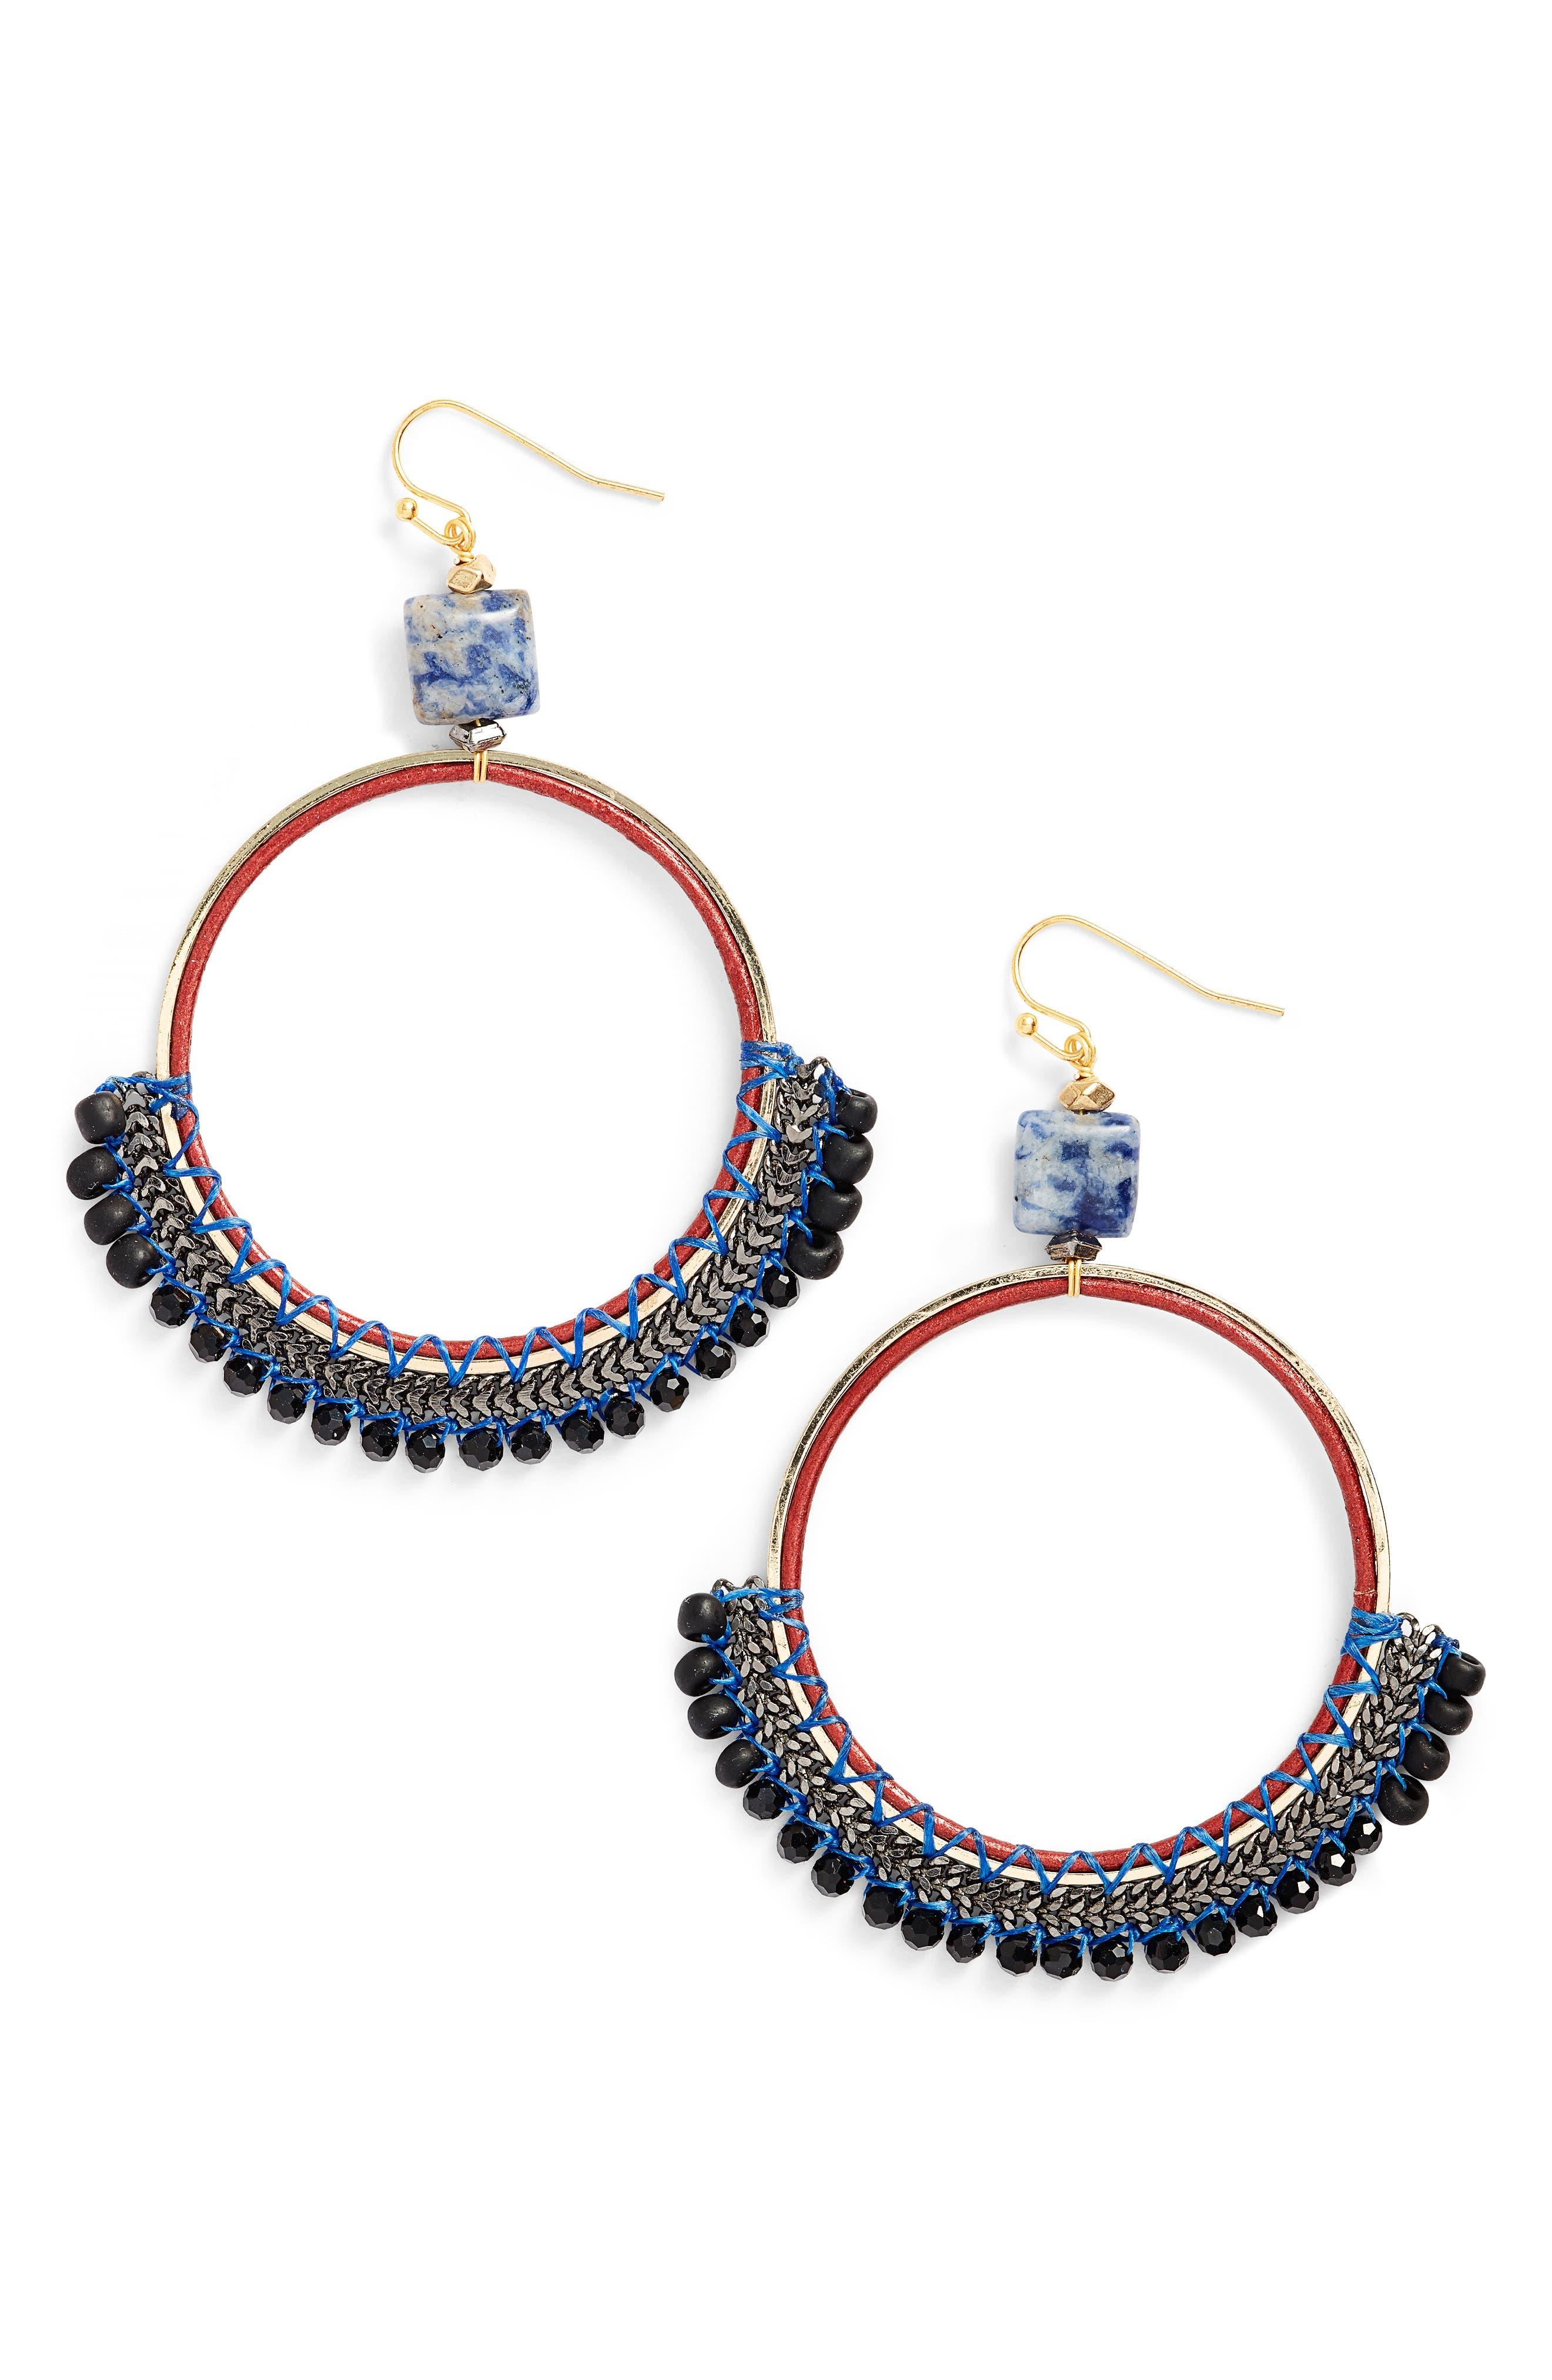 Bachubai Crystal & Chain Hoop Earrings,                             Main thumbnail 1, color,                             400